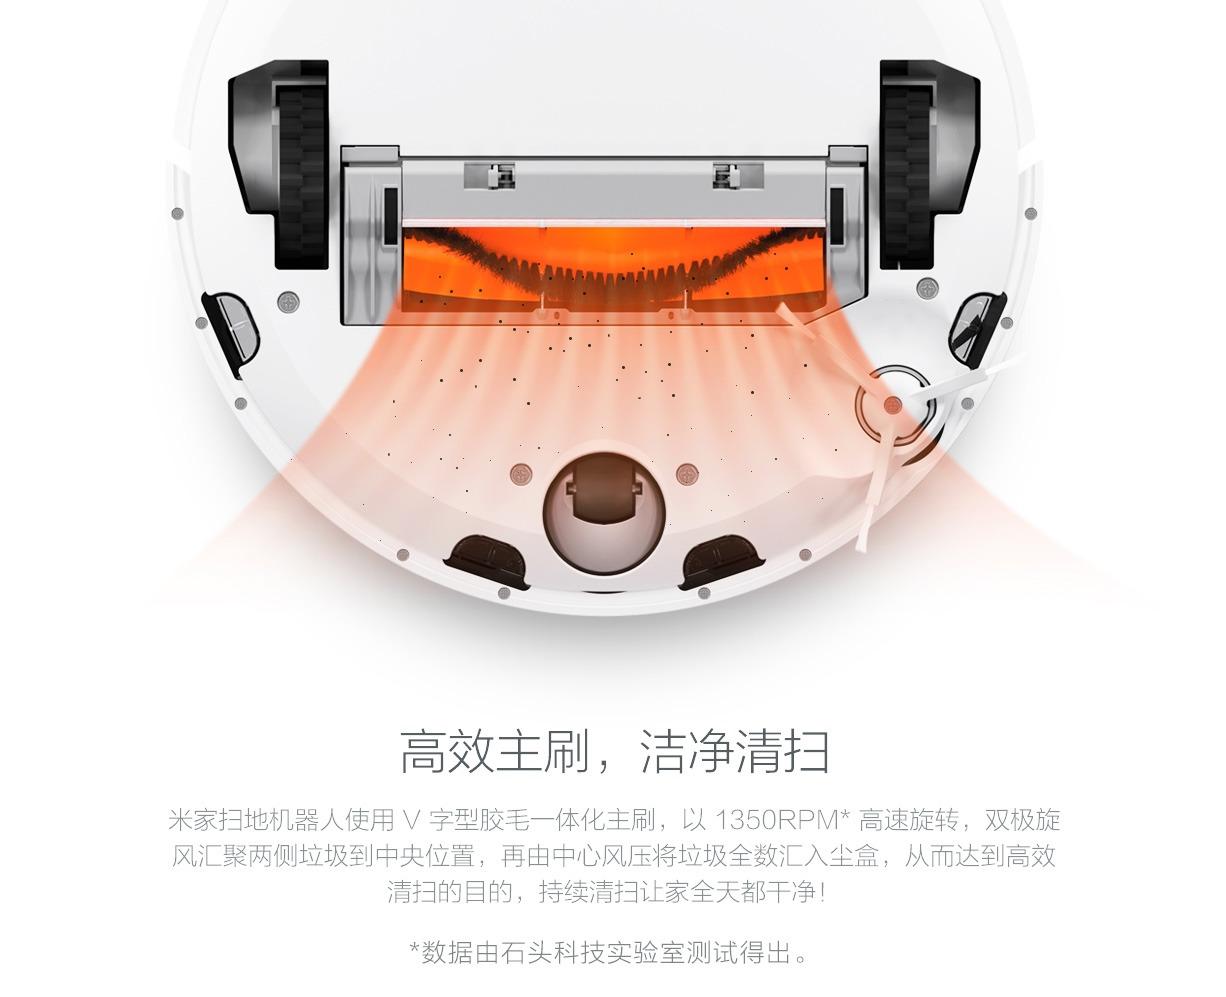 product_奇妙_米家扫地机器人主刷